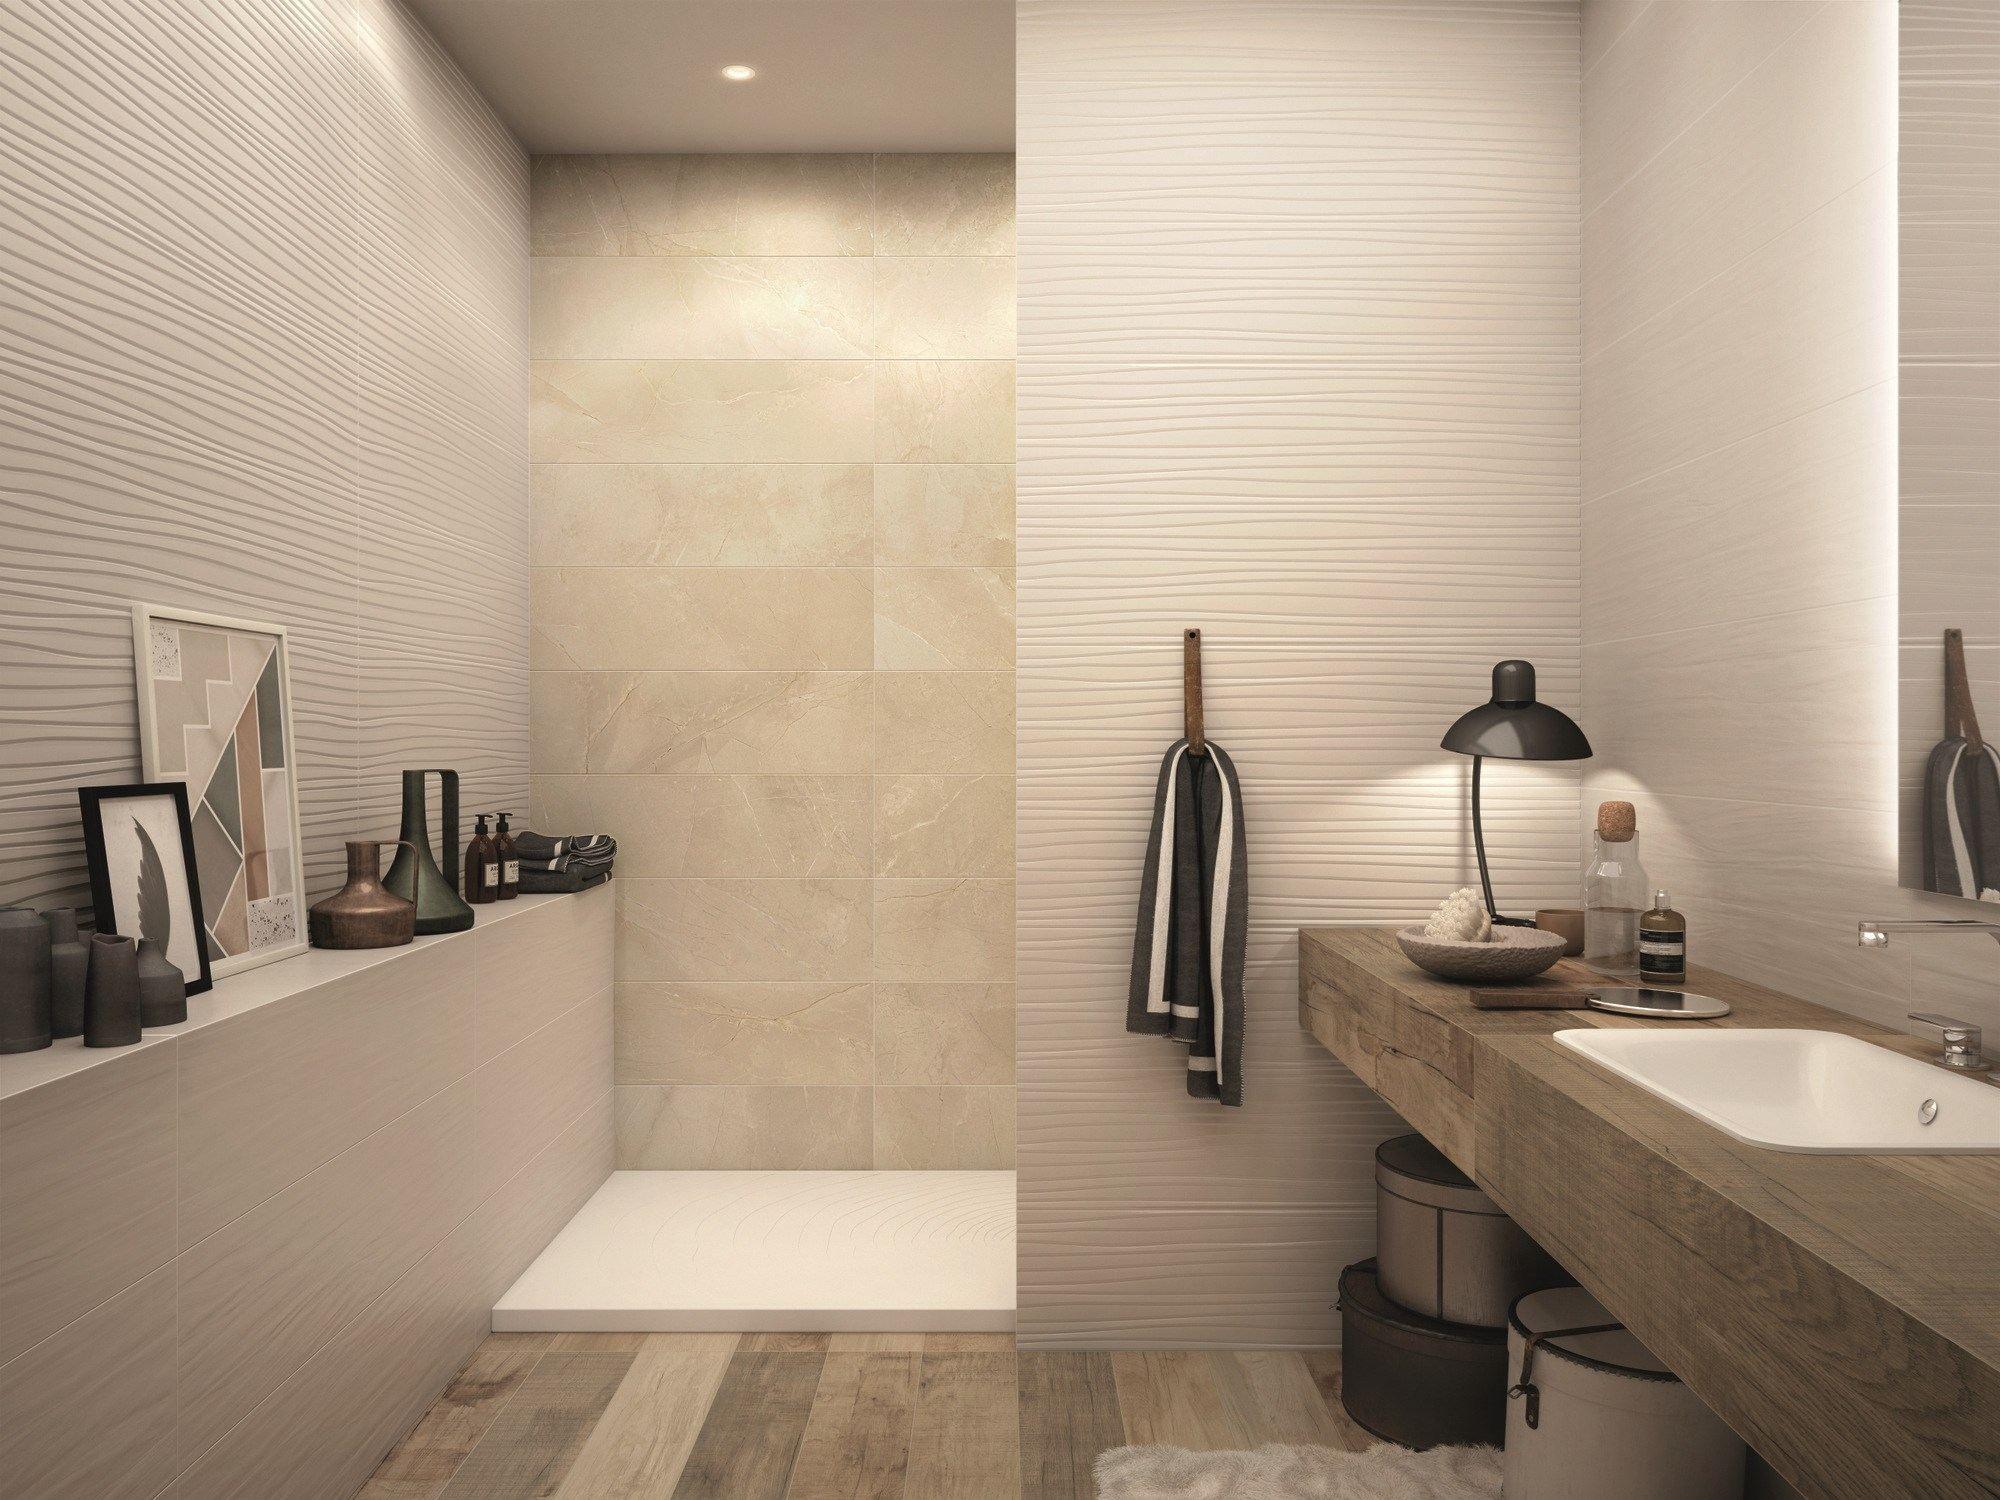 Badkamer Ideeen Hout : Badkamers m showroom beste prijs kwaliteit jan van sundert